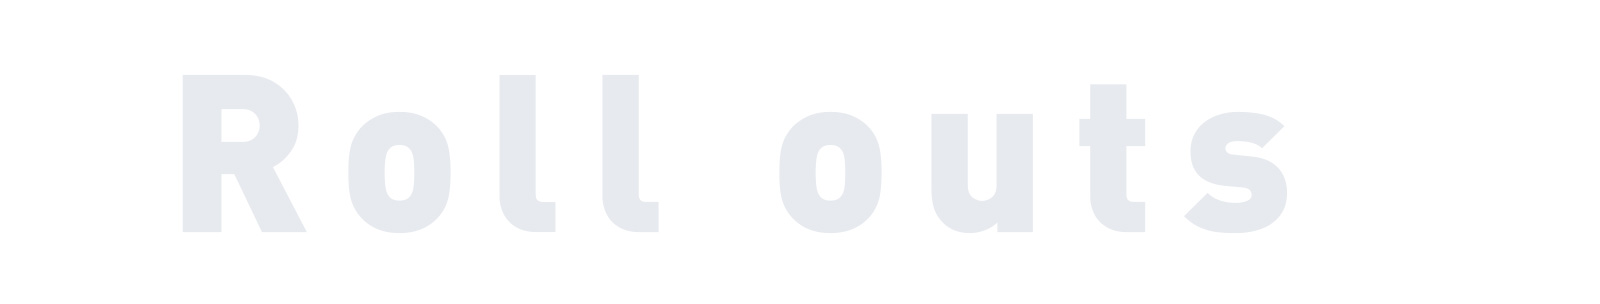 JCLeRoux_Layout_11